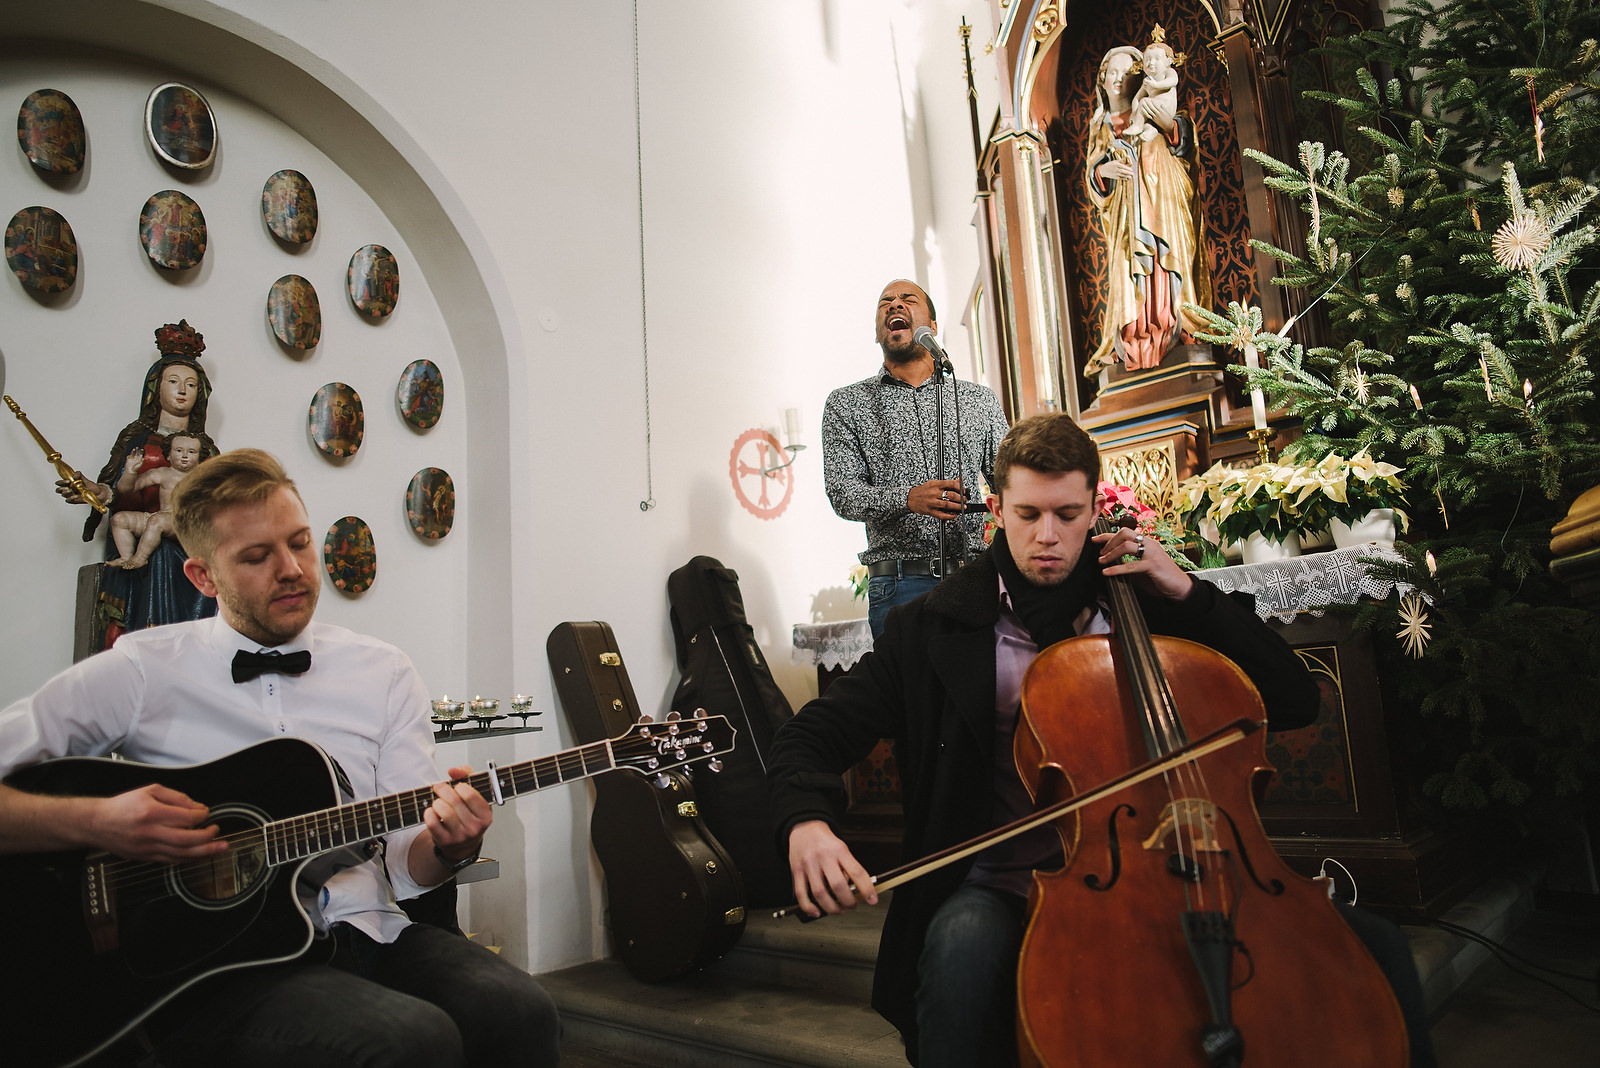 Fotograf Konstanz - Silvester Wedding in Hagnau / Friedrichshafen at Lake of Constance  - 13 -